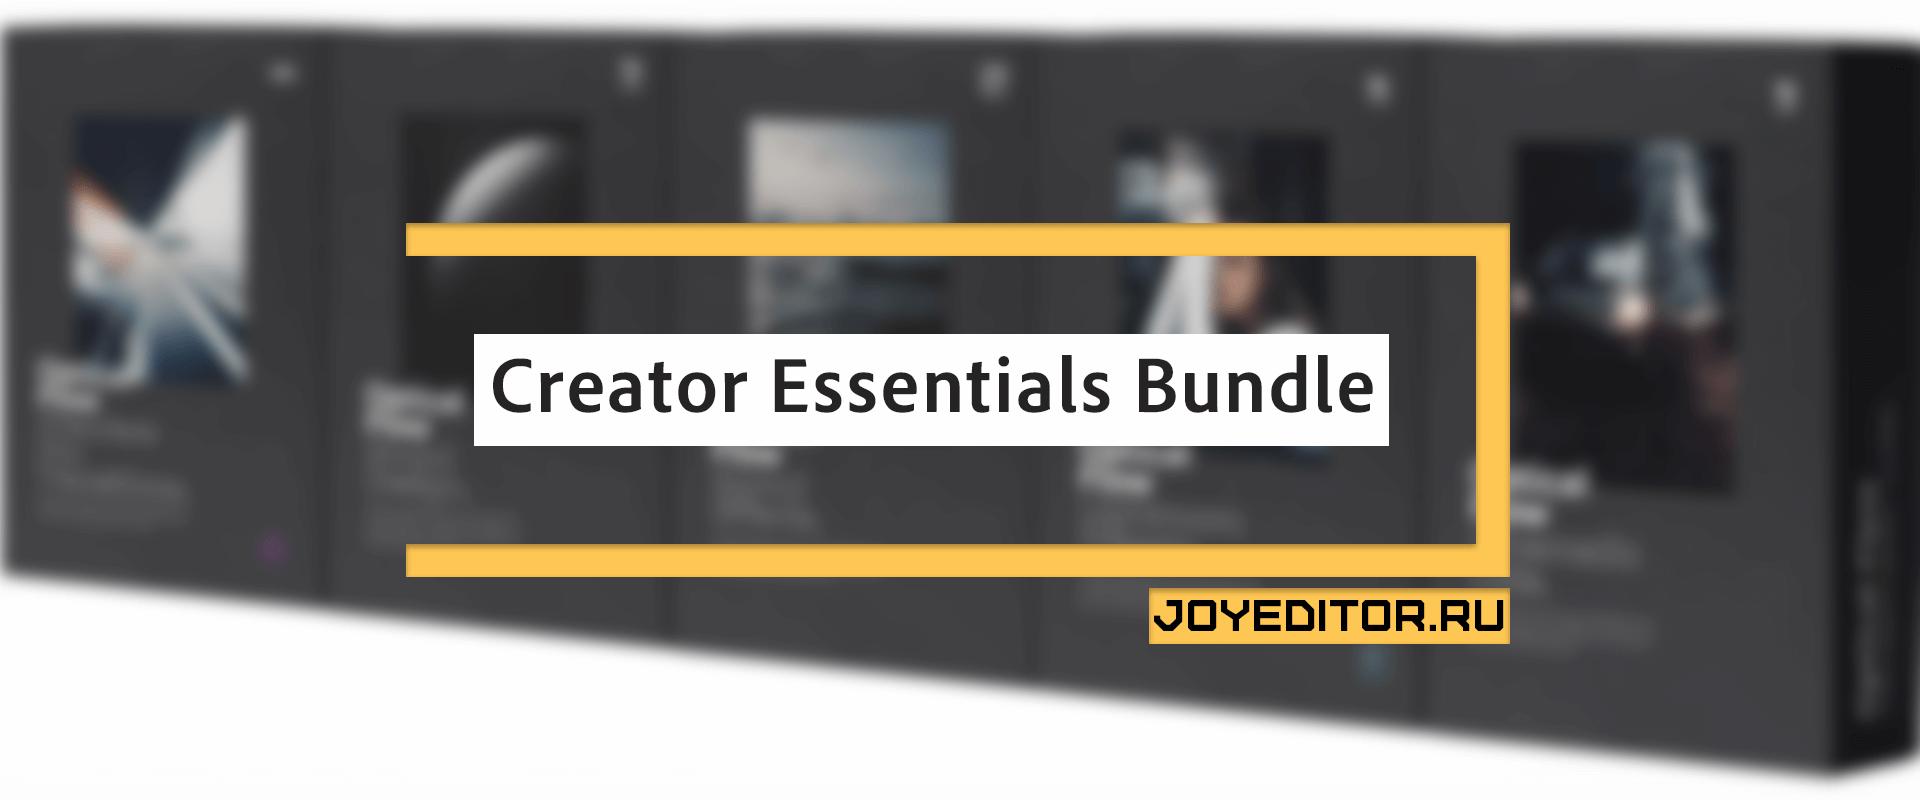 Creator Essentials Bundle